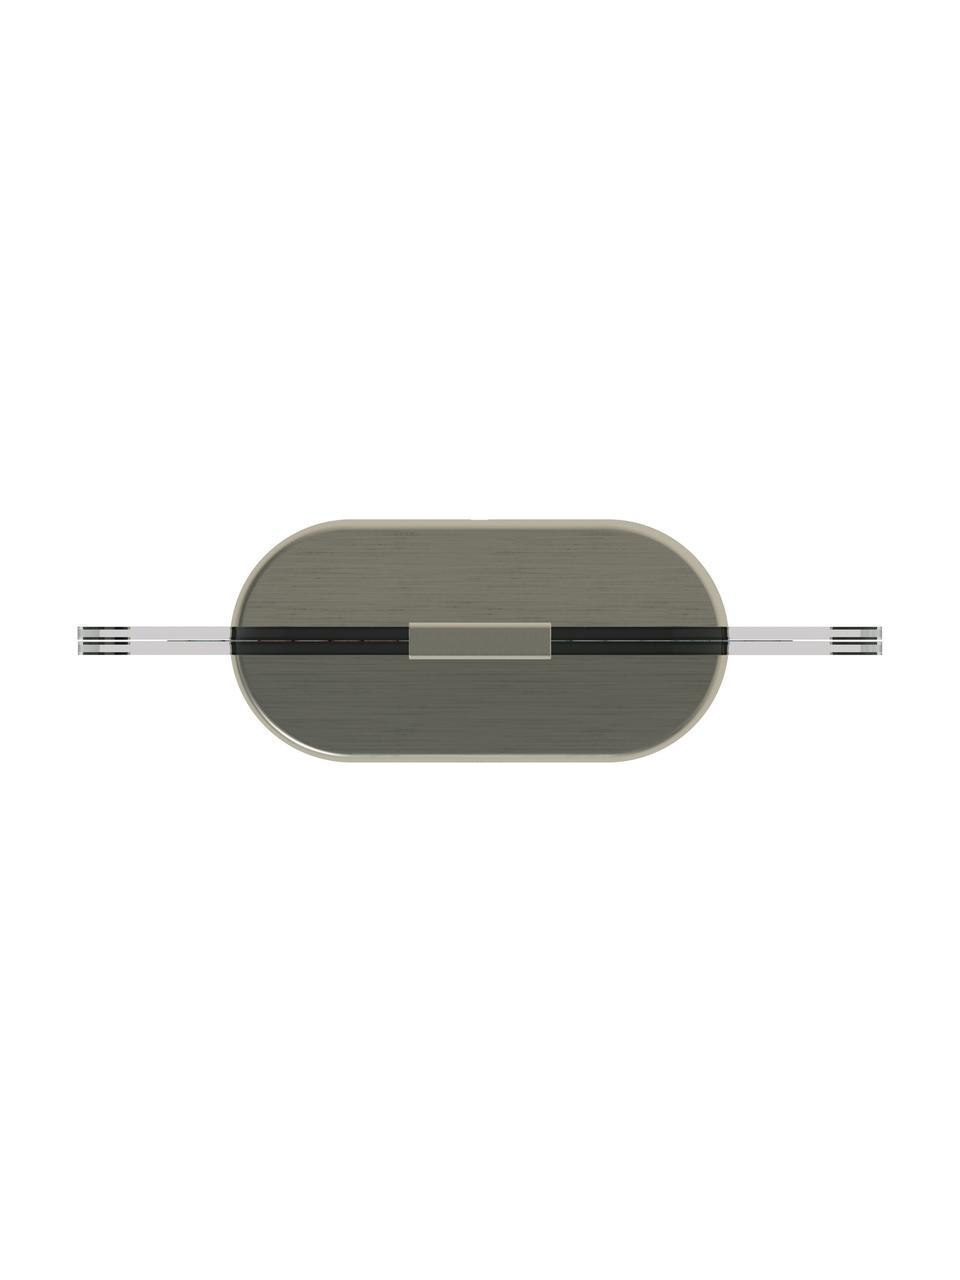 LED-Bilderrahmen Glo, Sockel: Metall, vernickelt, Nickelfarben, 13 x 18 cm